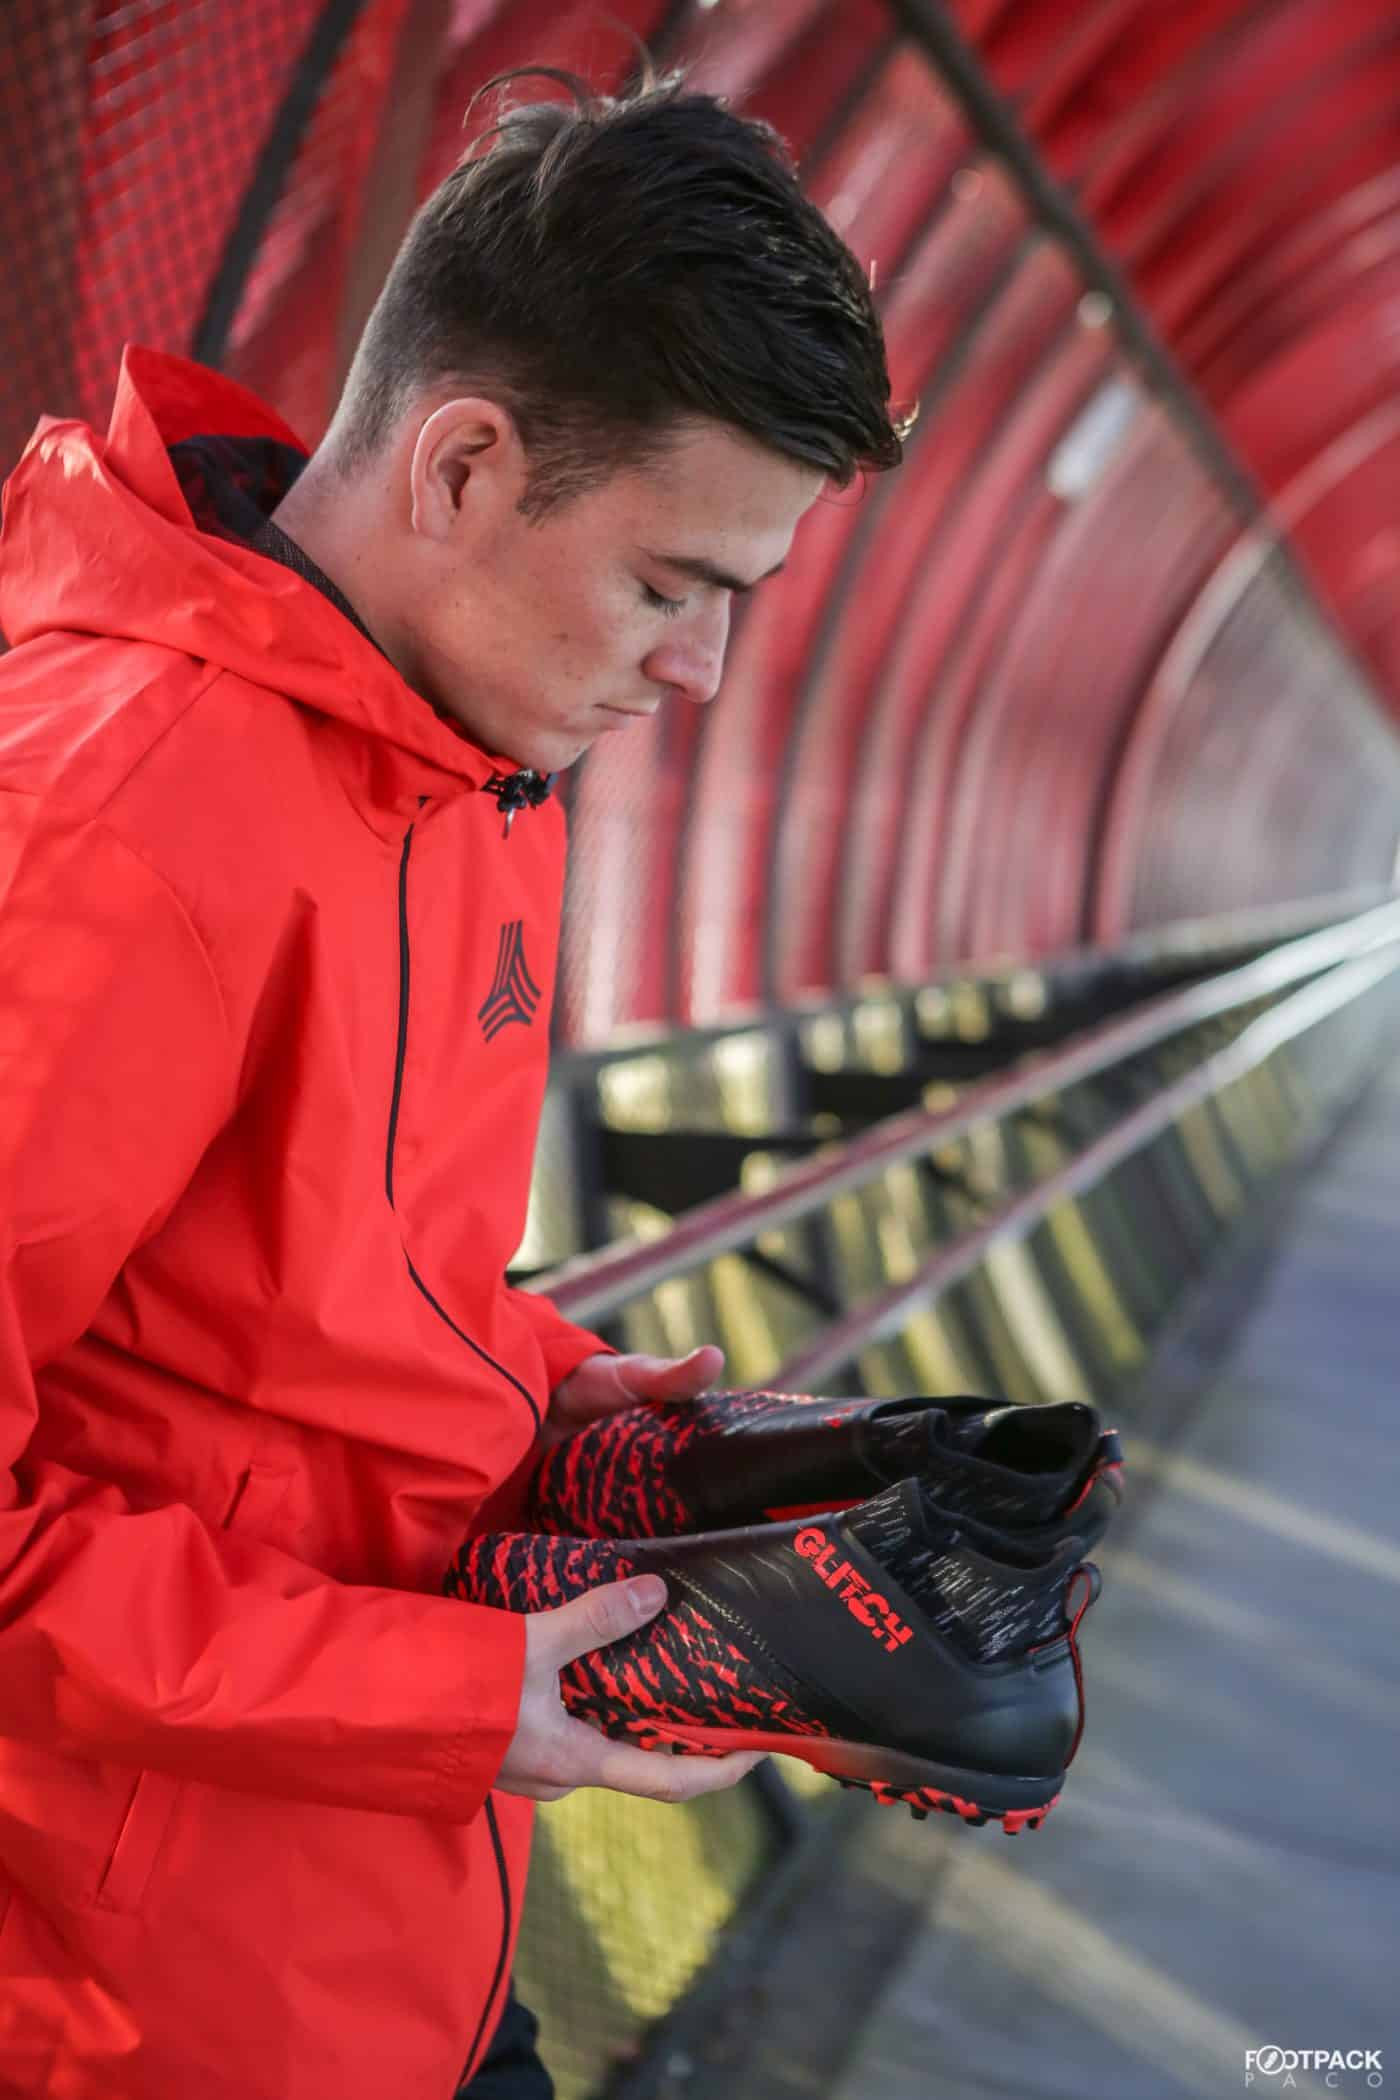 adidas-glitch-initiator-pack-turf-footpack-2